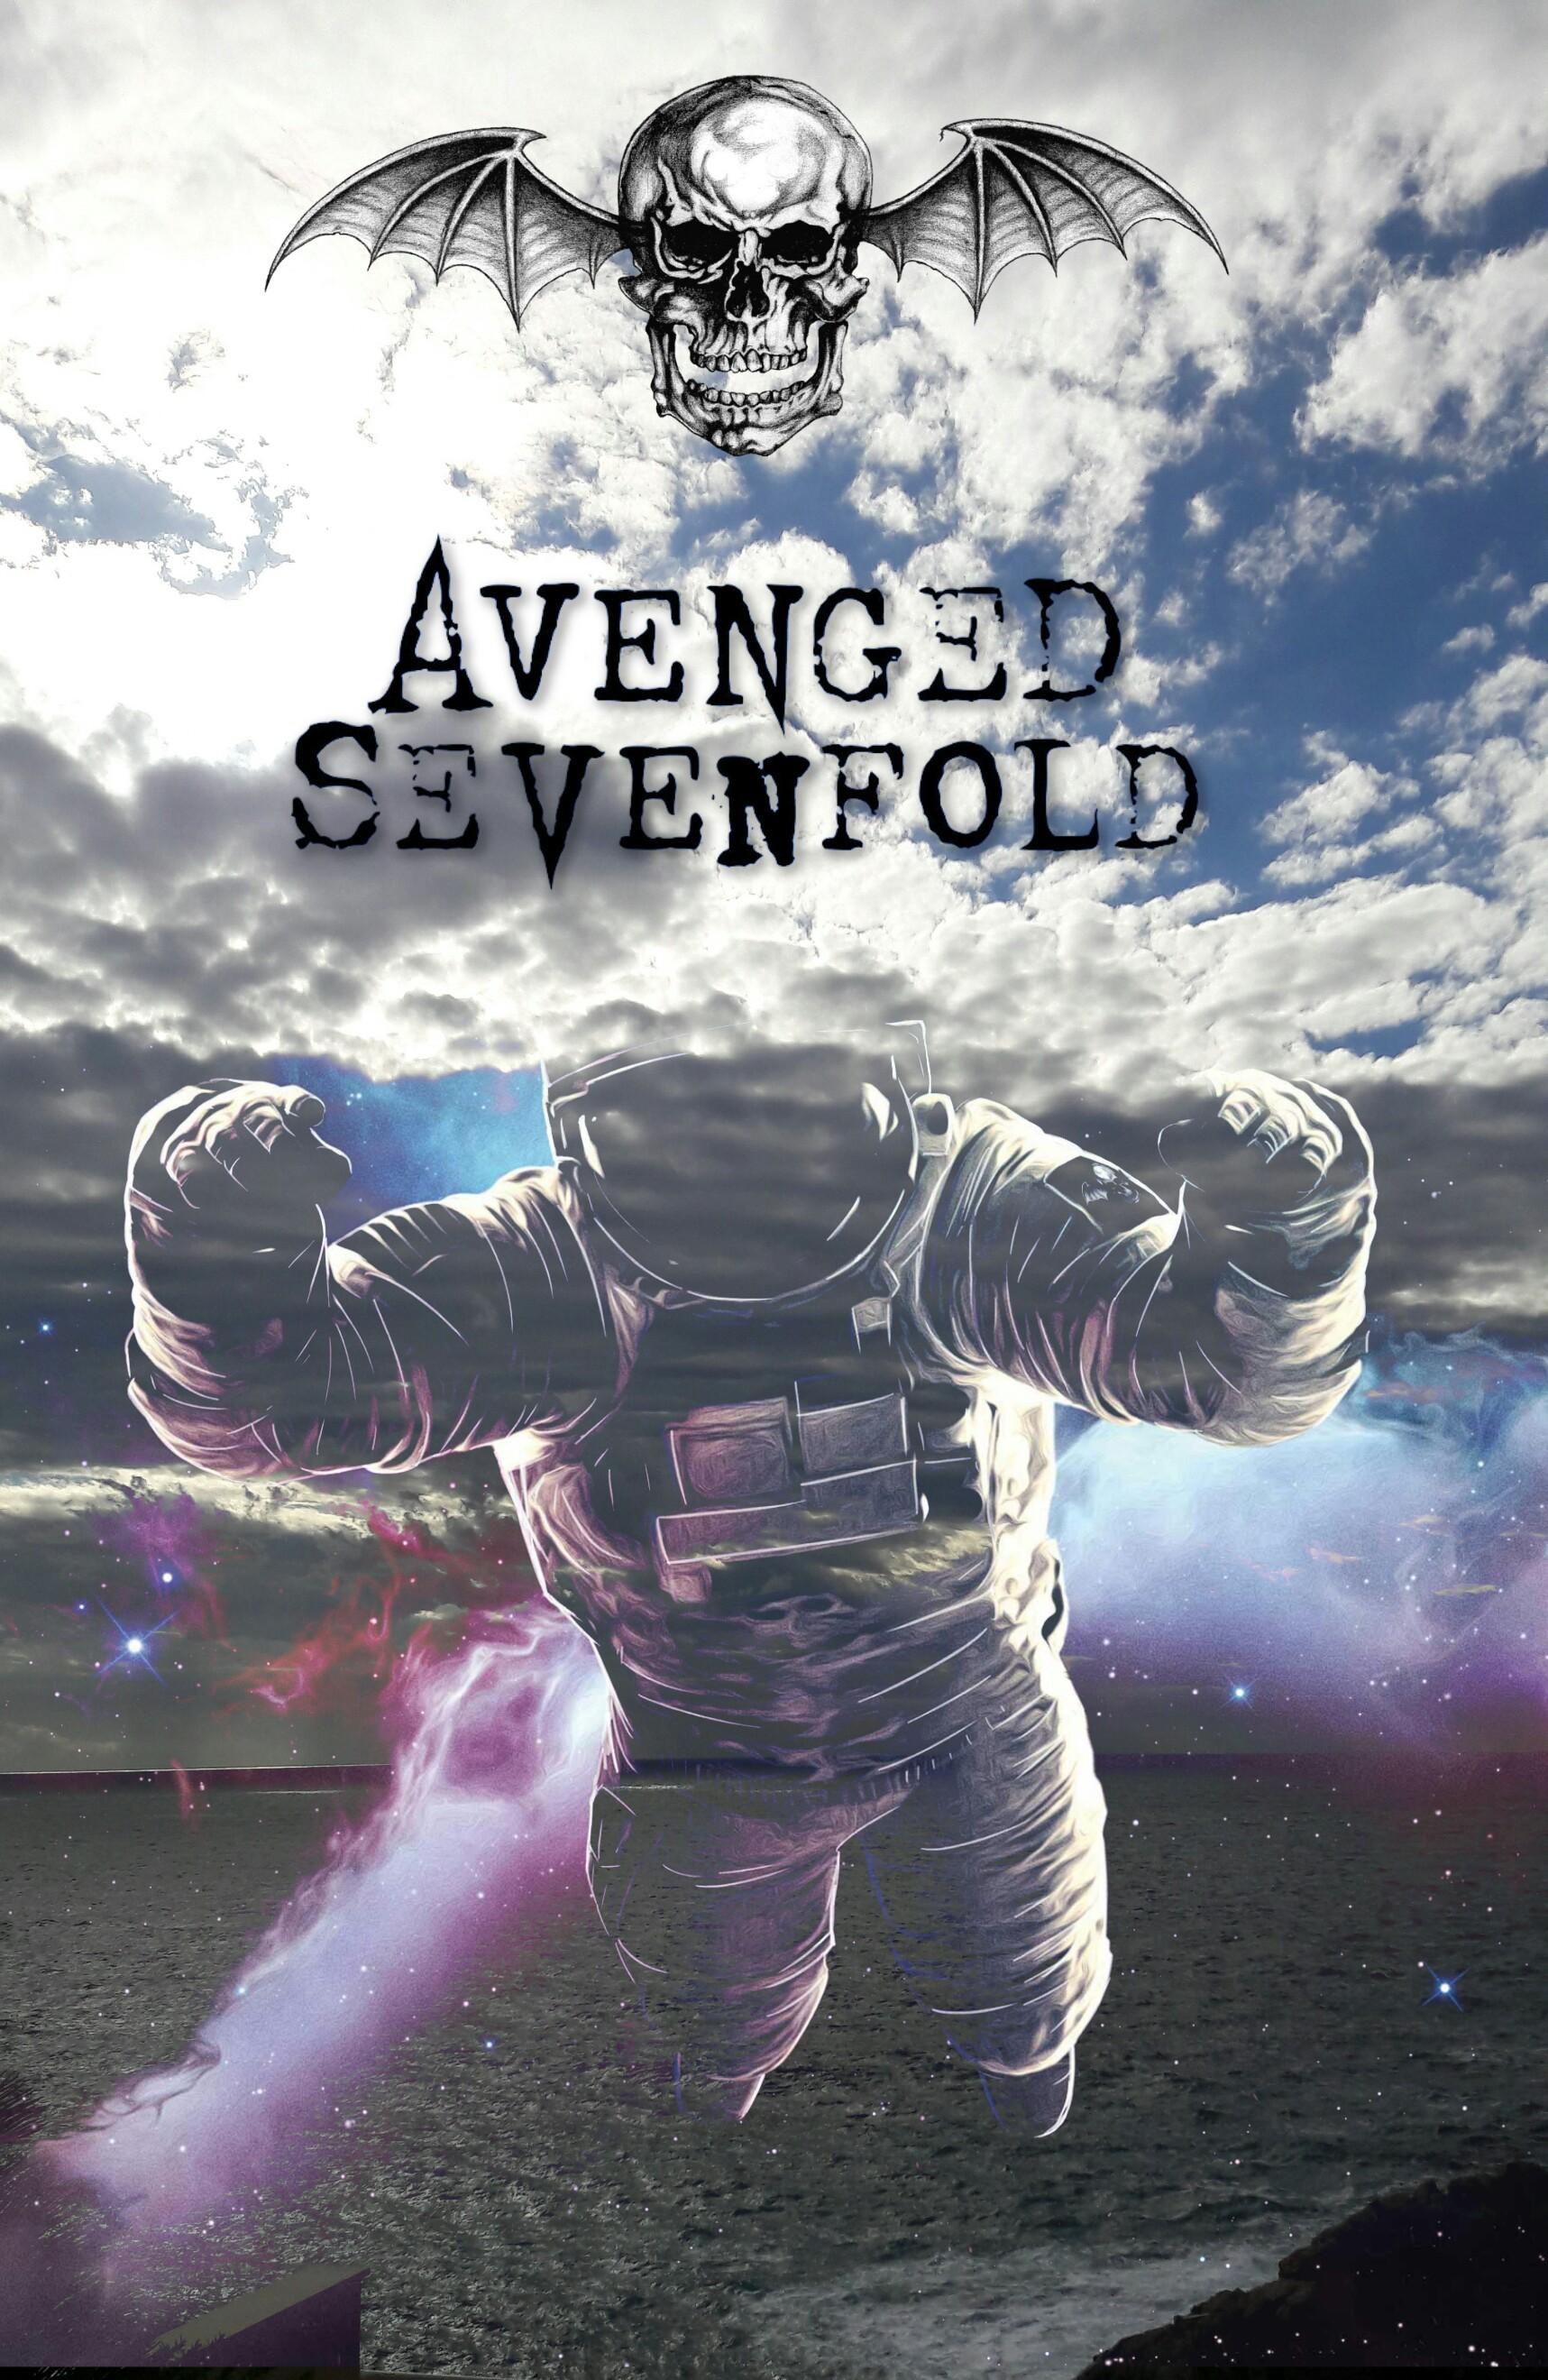 Avenged sevenfold background 61 images 1920x1080 avenged sevenfold backdrop wallpaper voltagebd Images